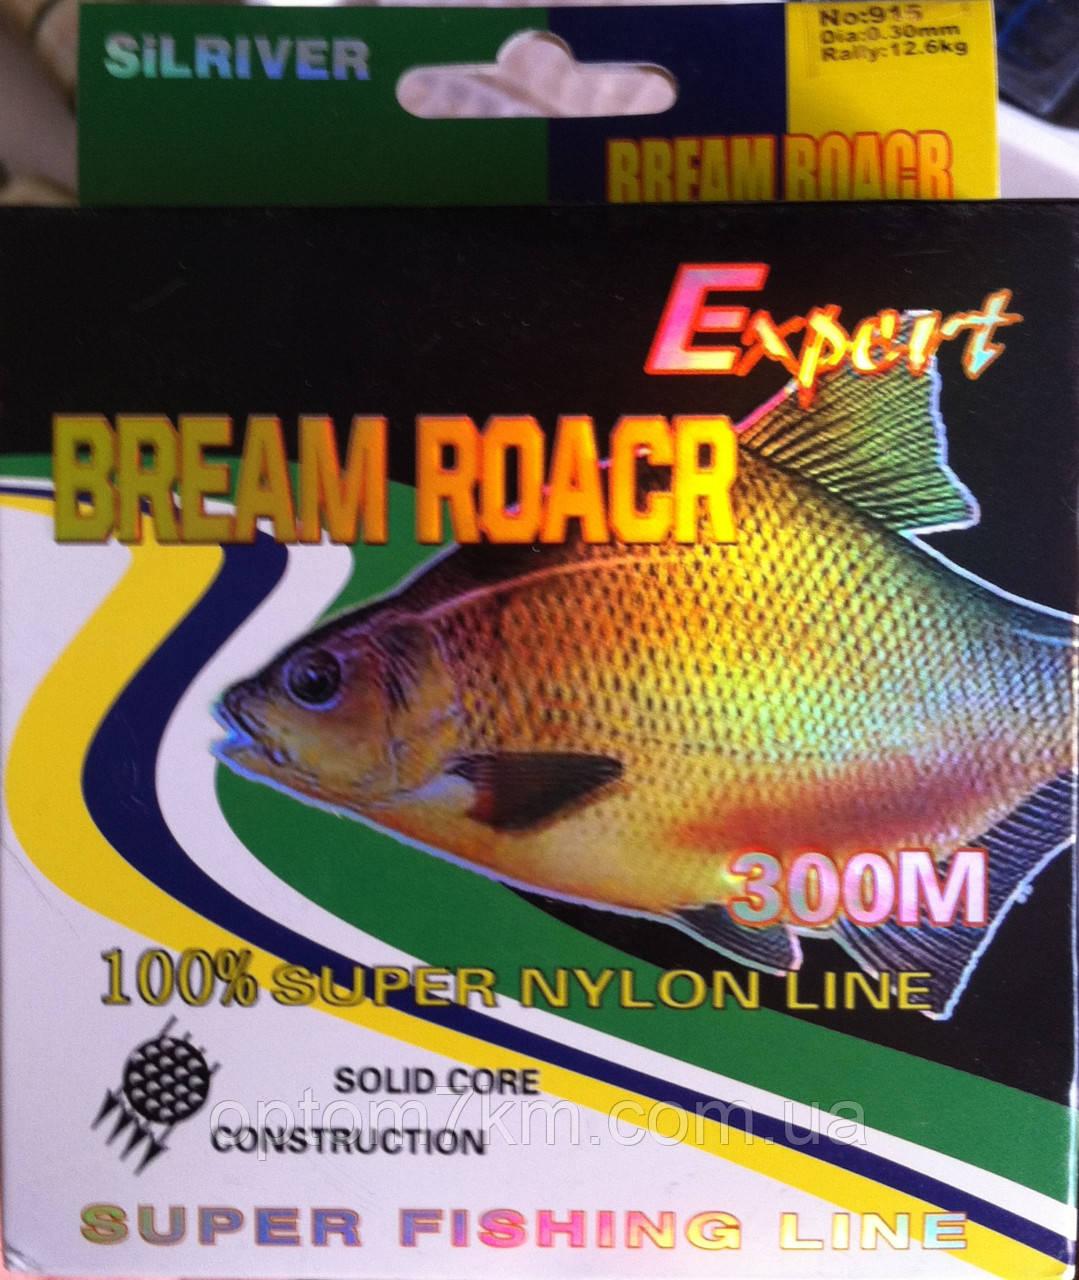 Леска Silriver Bream Roacr 300m